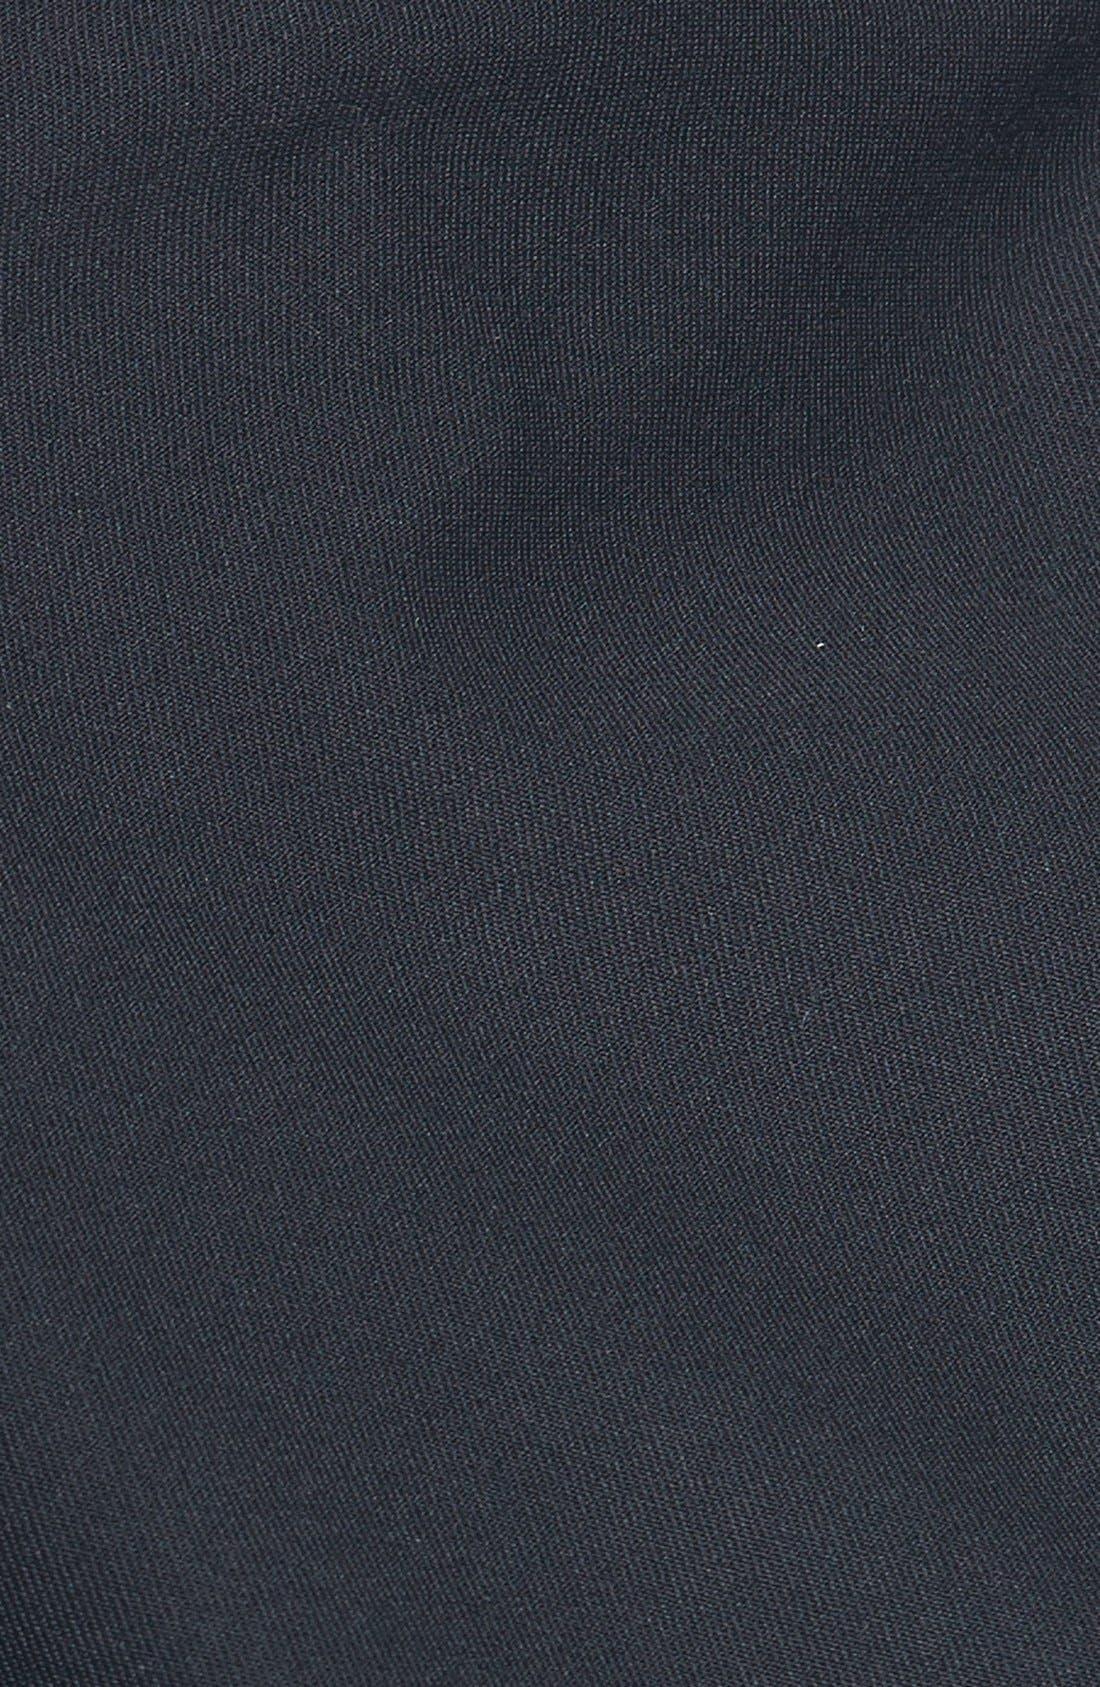 Alternate Image 3  - Nike 'Tech' Dri-FIT Tights